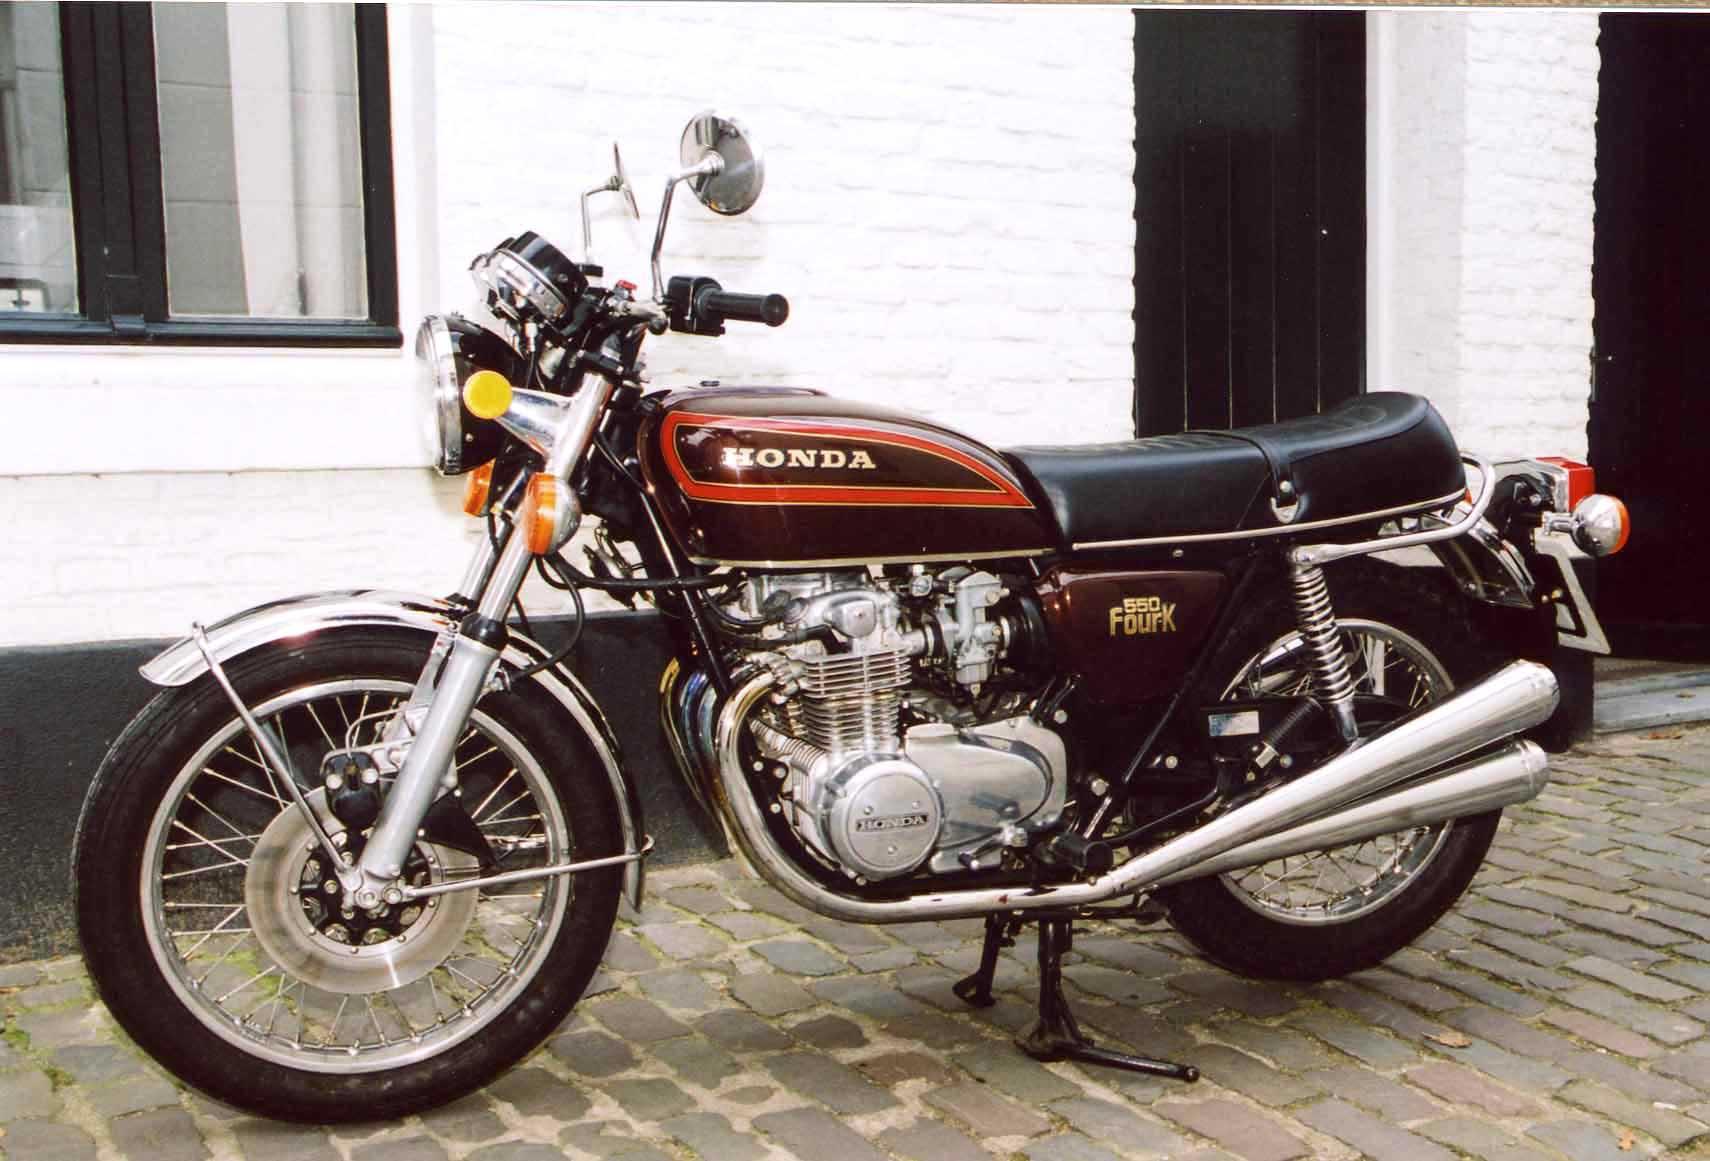 HondaCB550FourK1977